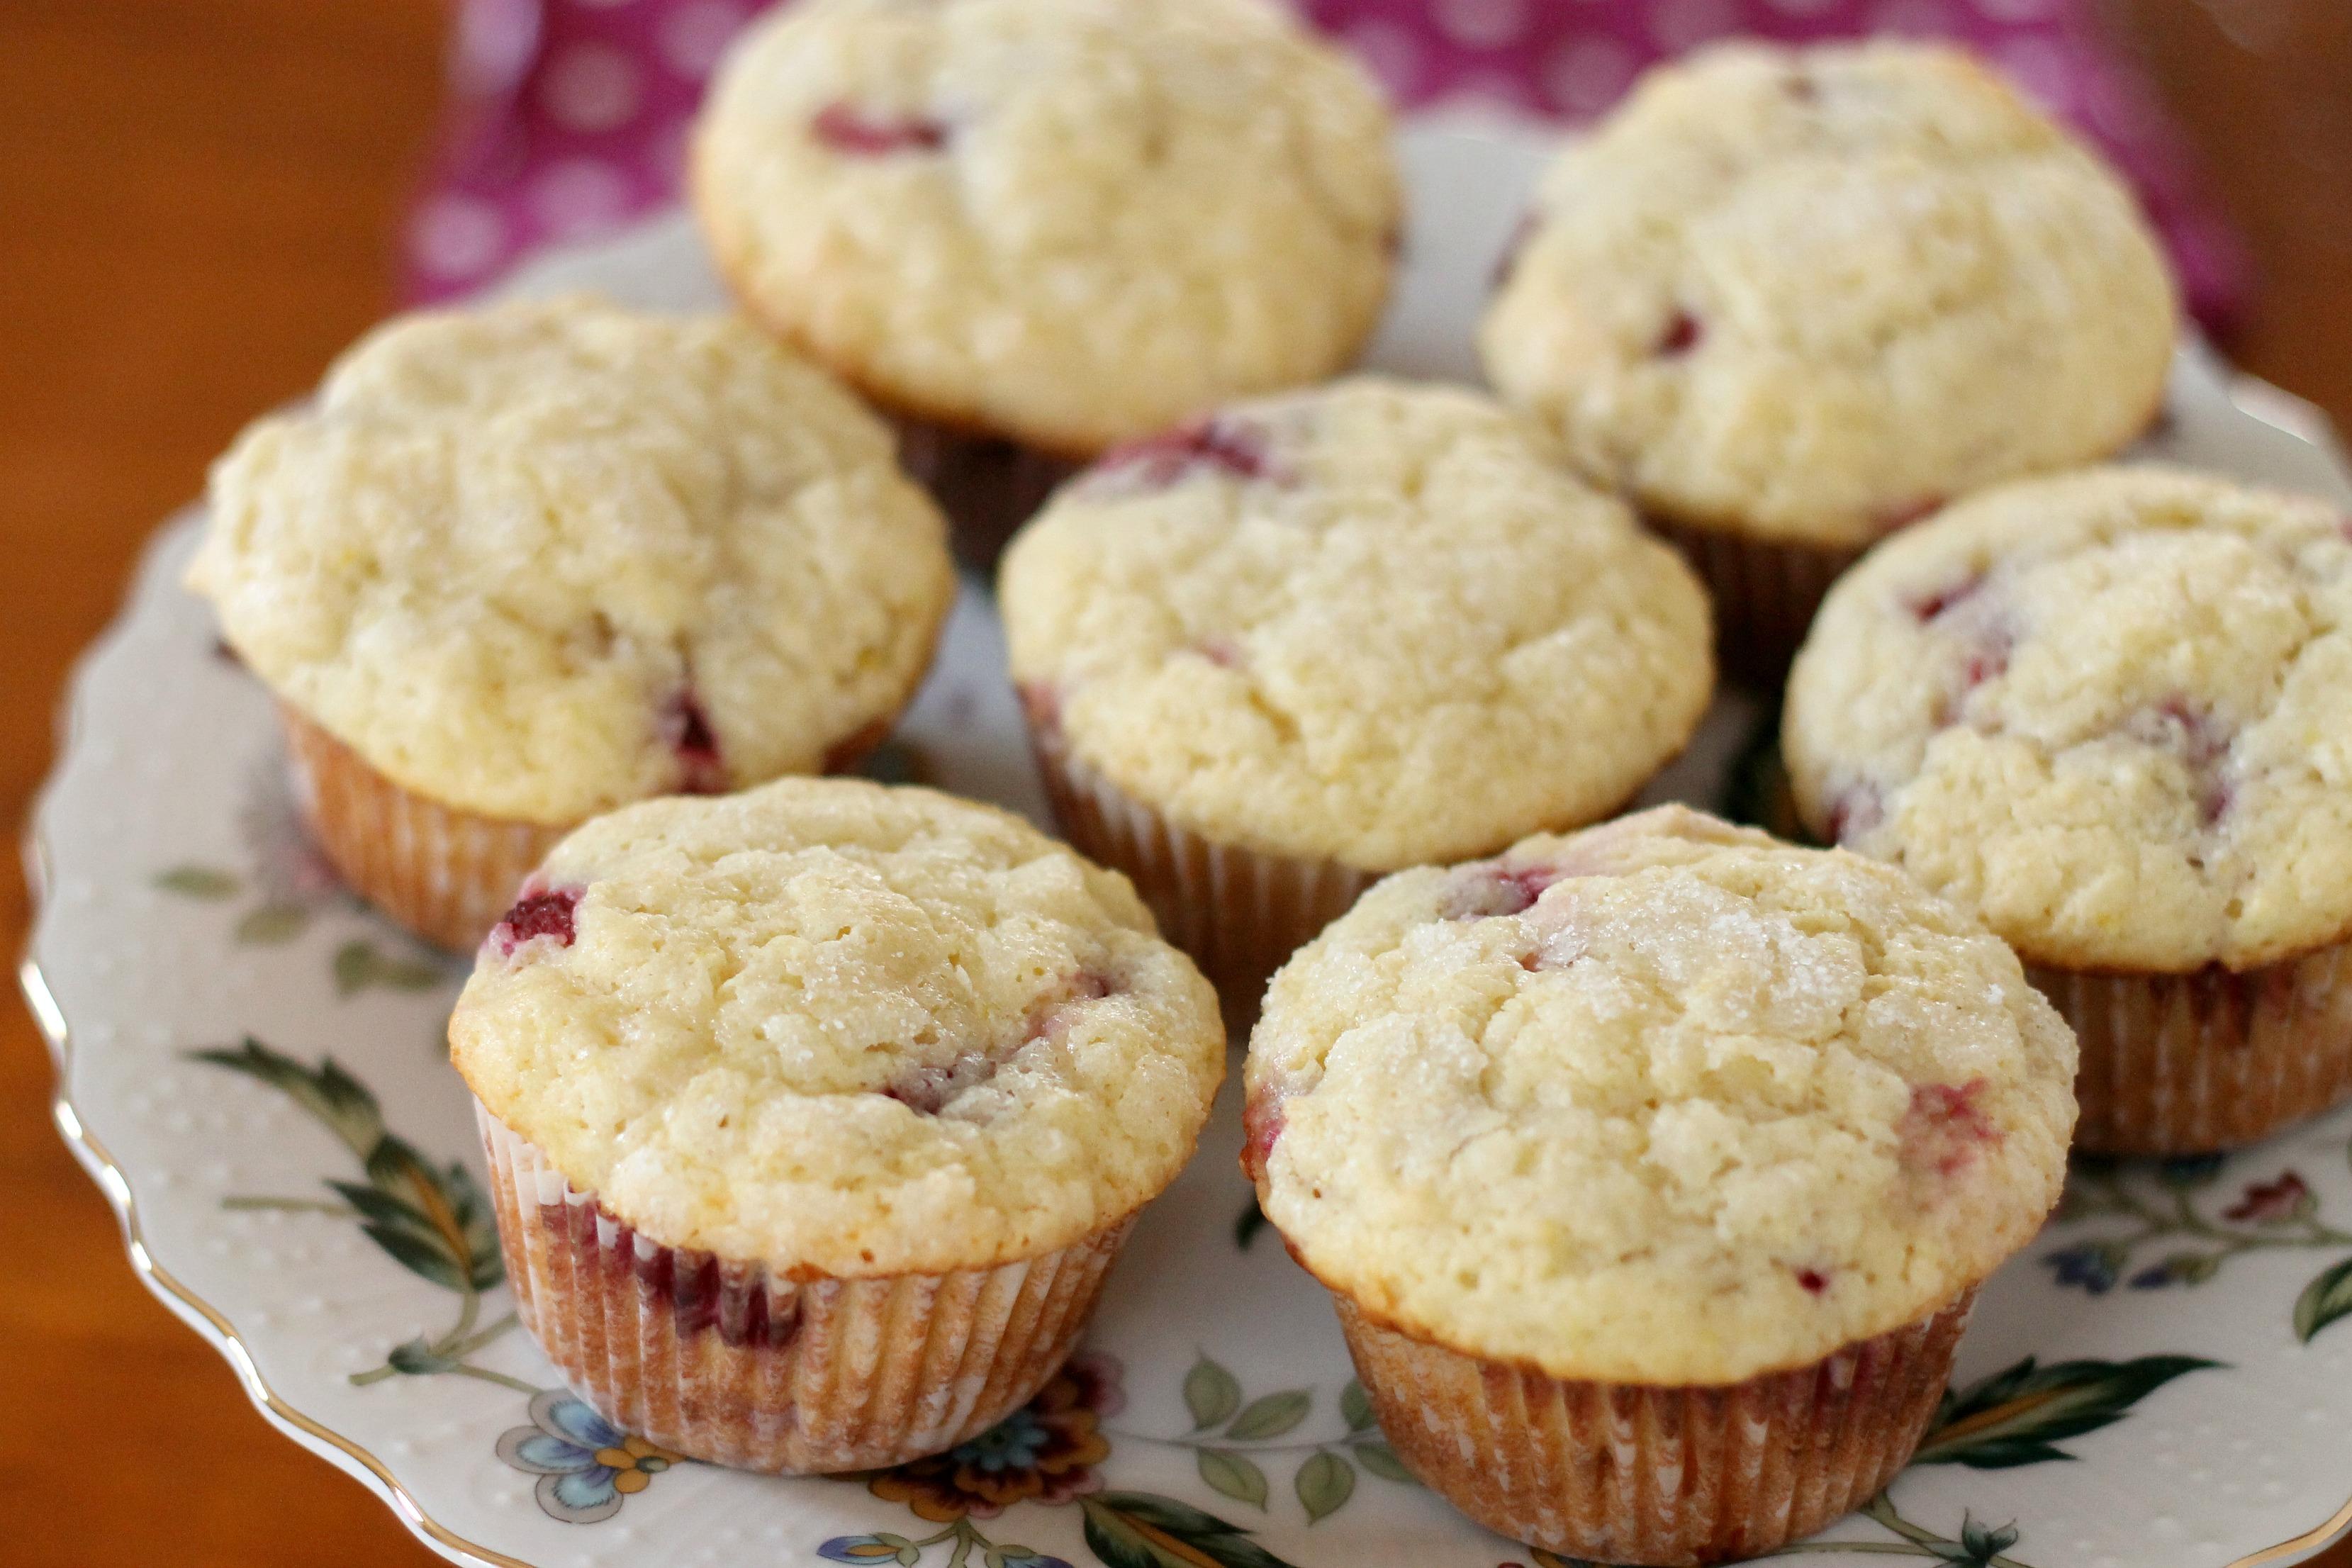 Lemon Raspberry Ricotta Muffins | We Like Two Cook